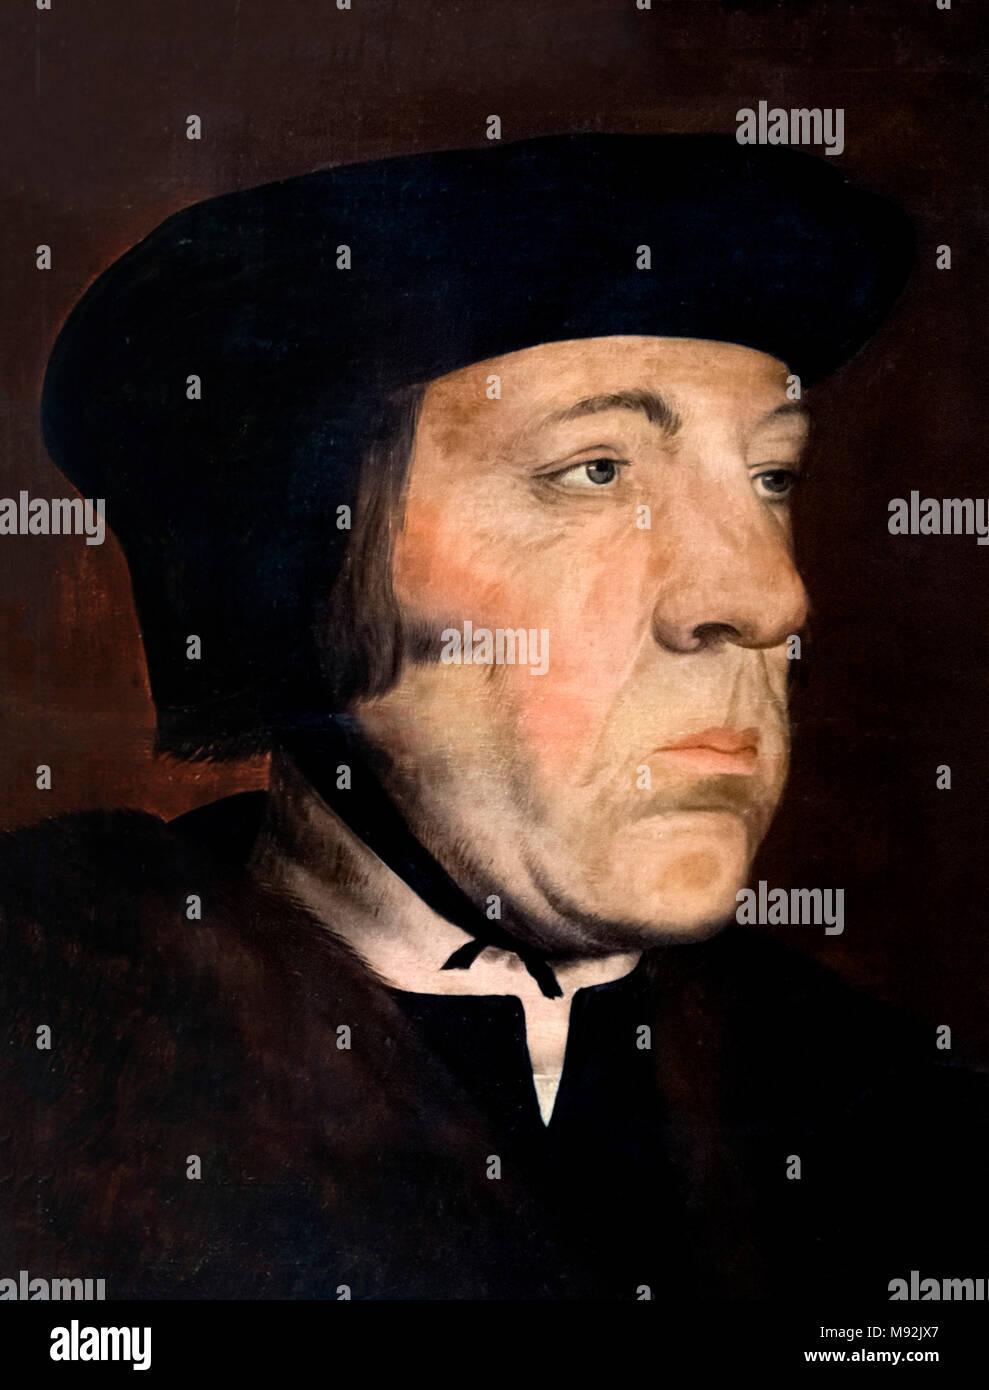 Sir Thomas More (1748-1535). - Stock Image